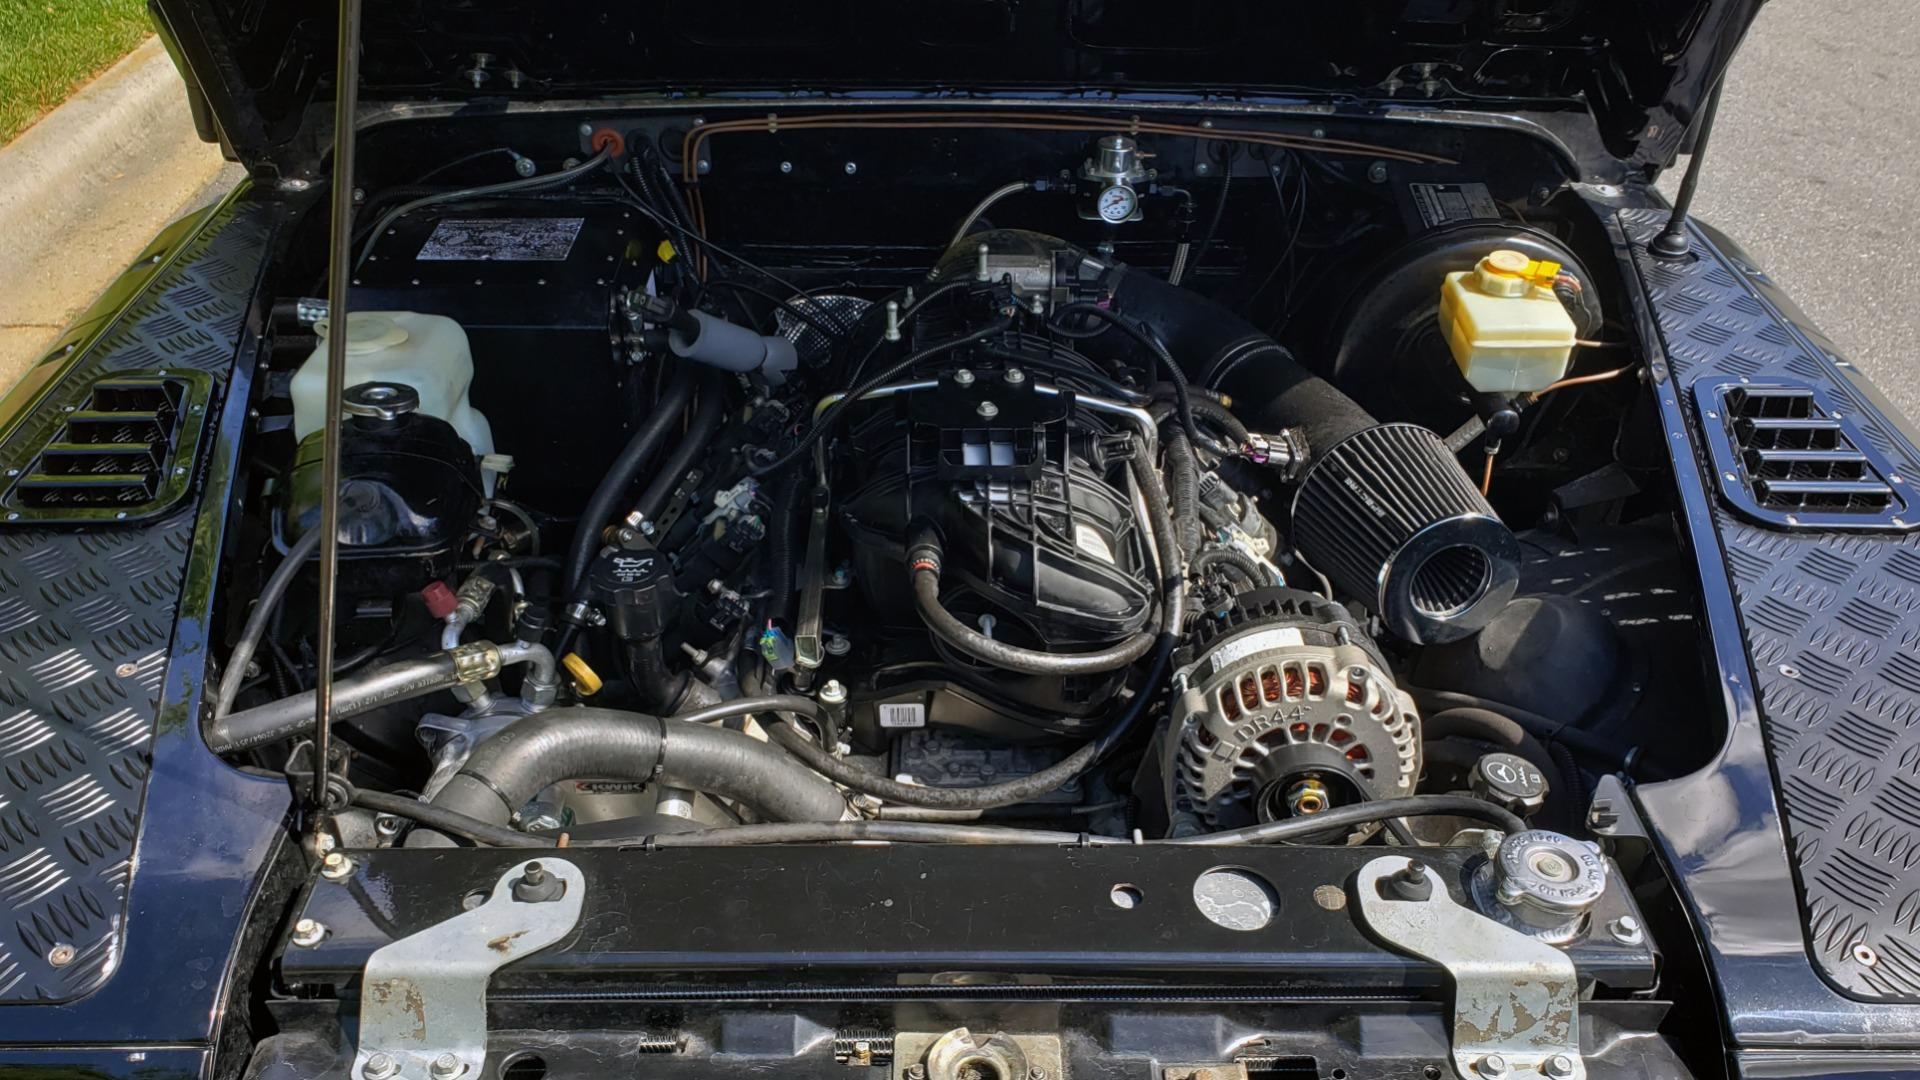 Used 1985 Land Rover DEFENDER 90 4X4 CUSTOM RESTORED 5.3L LS V8 for sale Sold at Formula Imports in Charlotte NC 28227 51